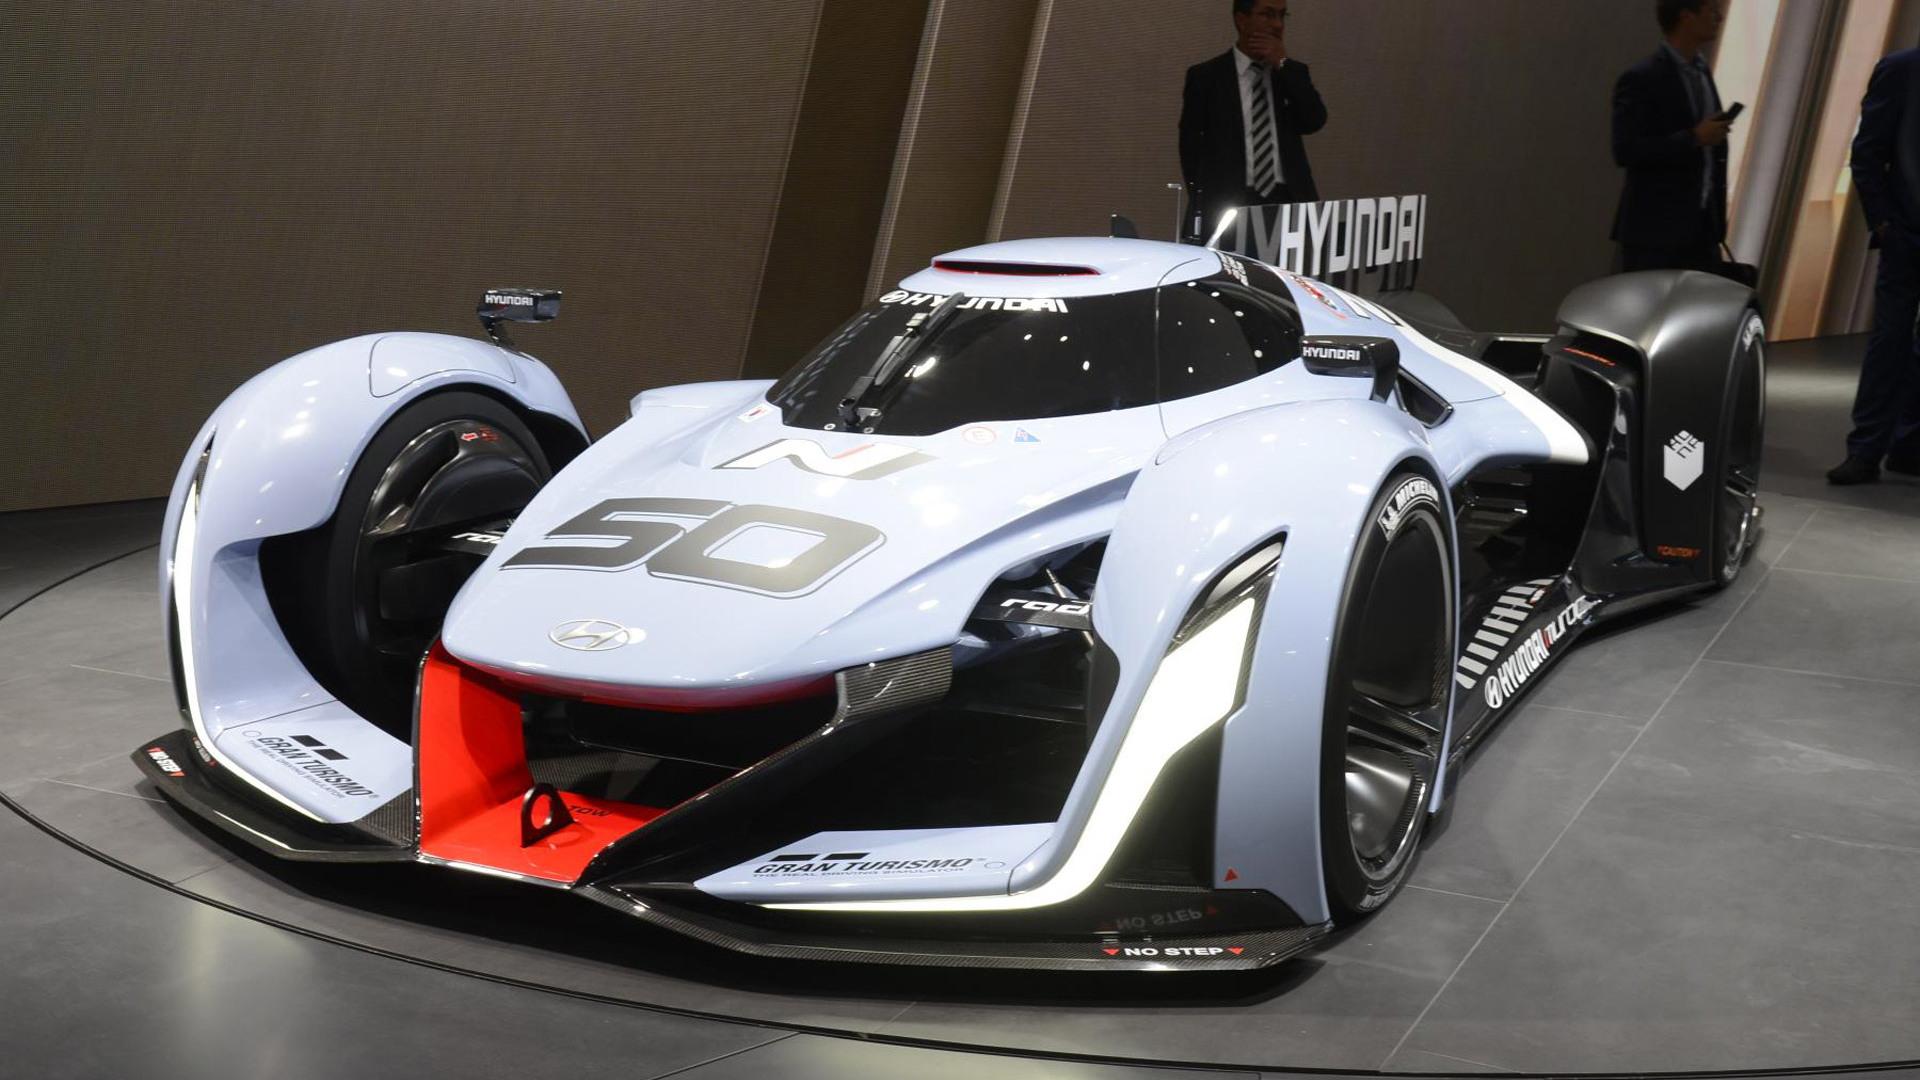 Hyundai N 2025 Vision Gran Turismo concept, 2015 Frankfurt Auto Show